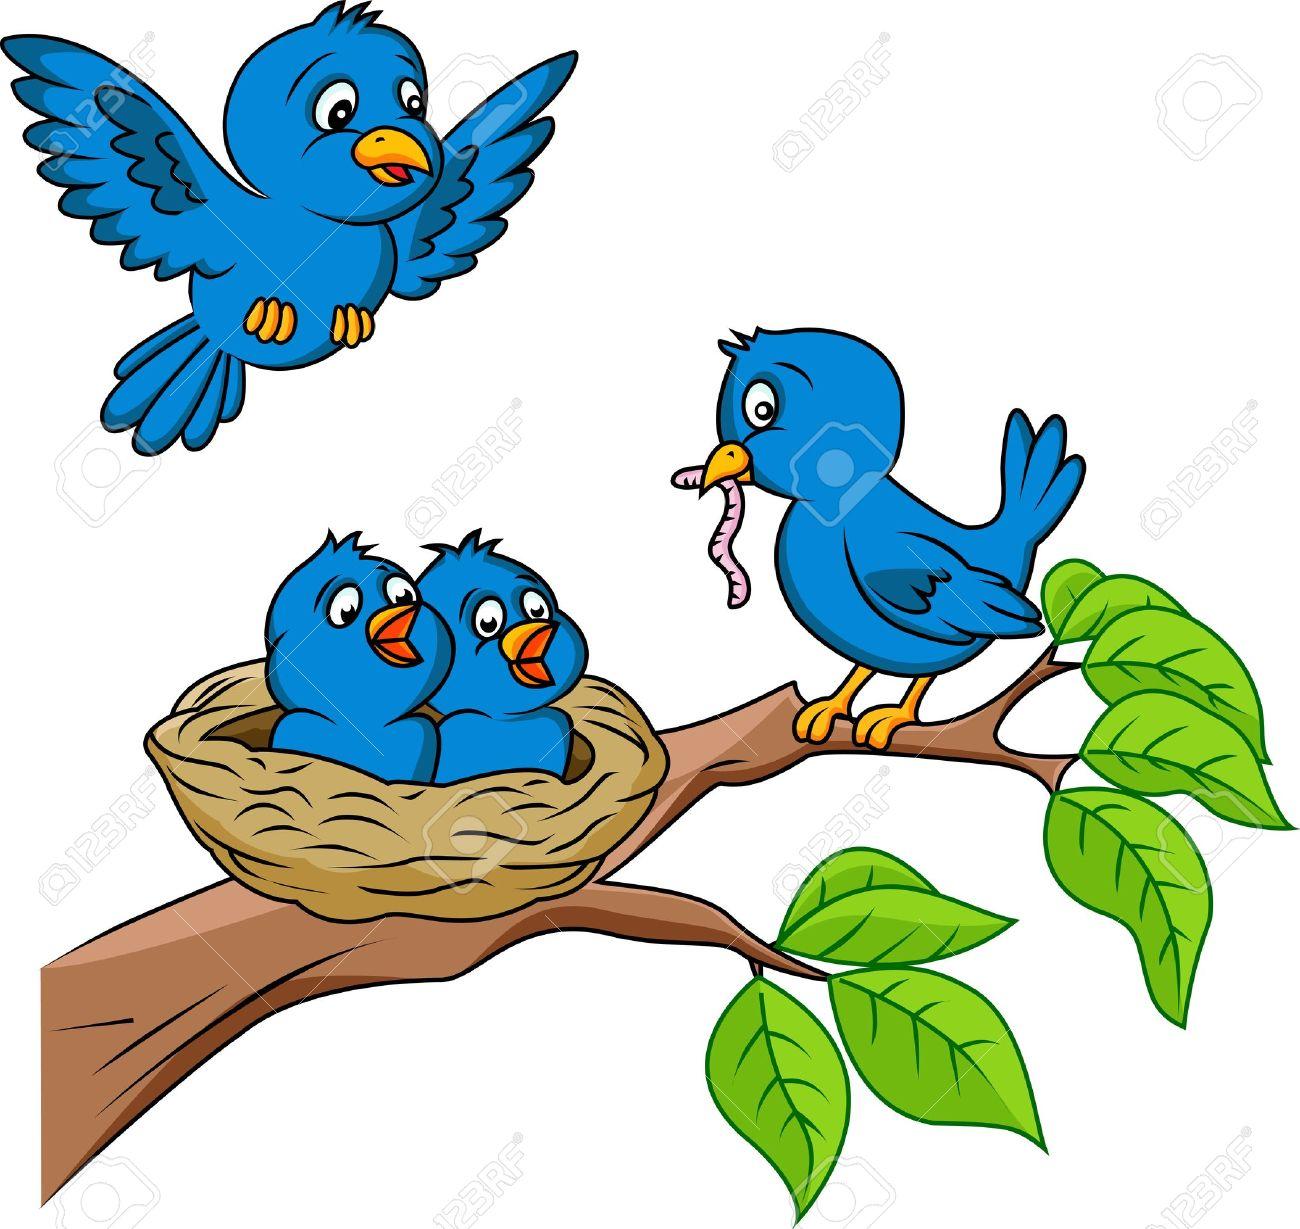 Bird Nest Cartoon | Free download best Bird Nest Cartoon on ... clipart library download